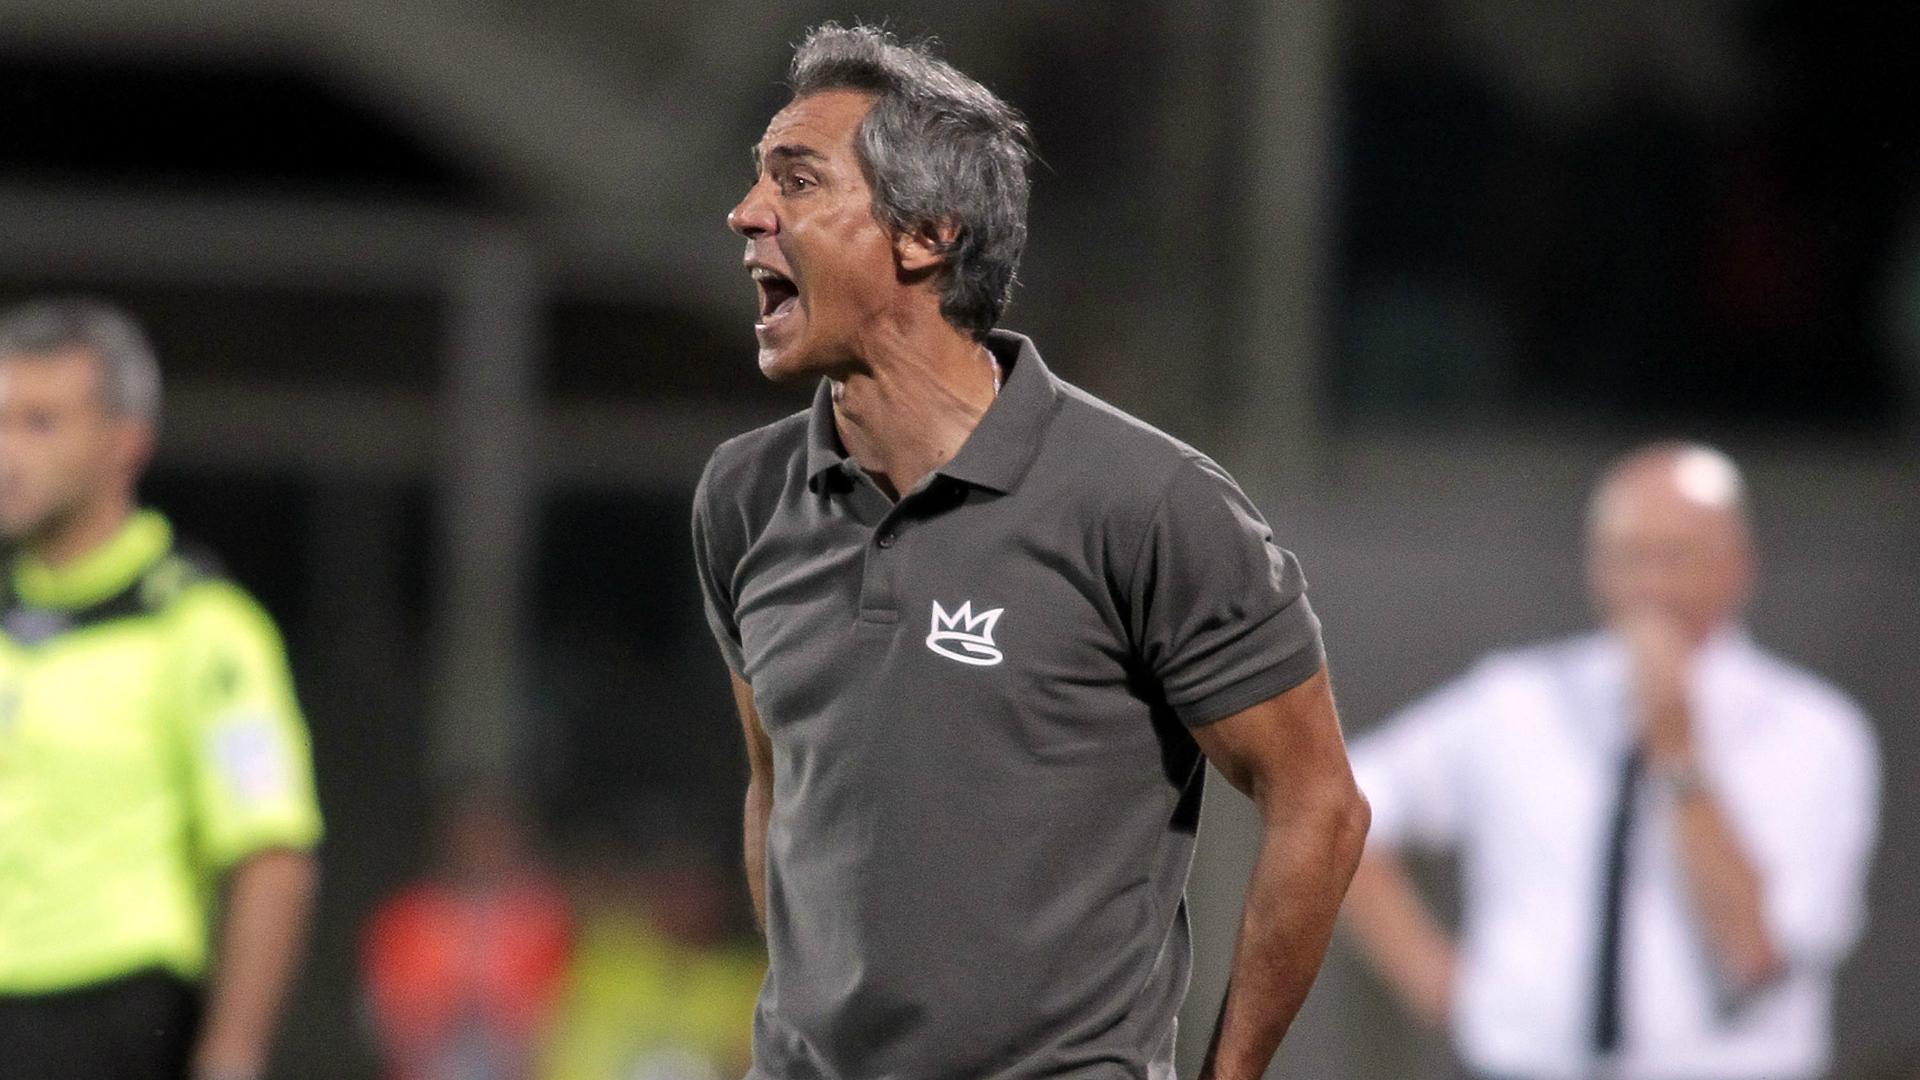 Serie A, Fiorentina: Paulo Sousa pensa alle dimissioni?